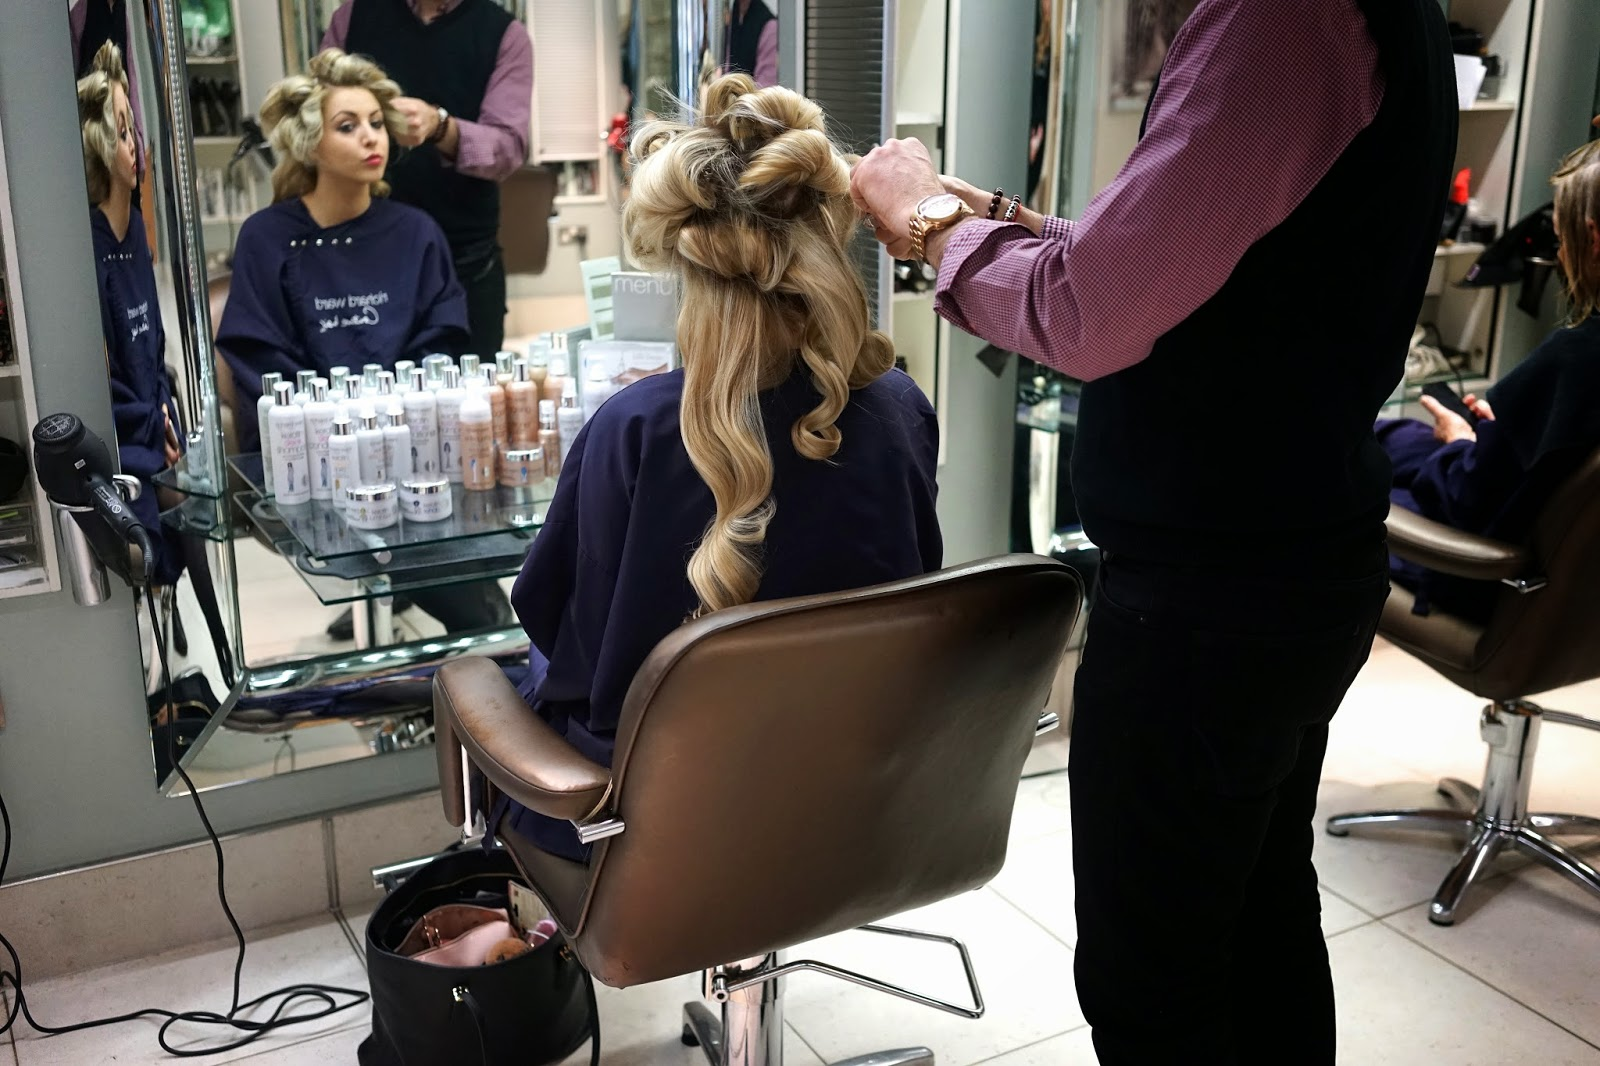 Kayleigh couture girl